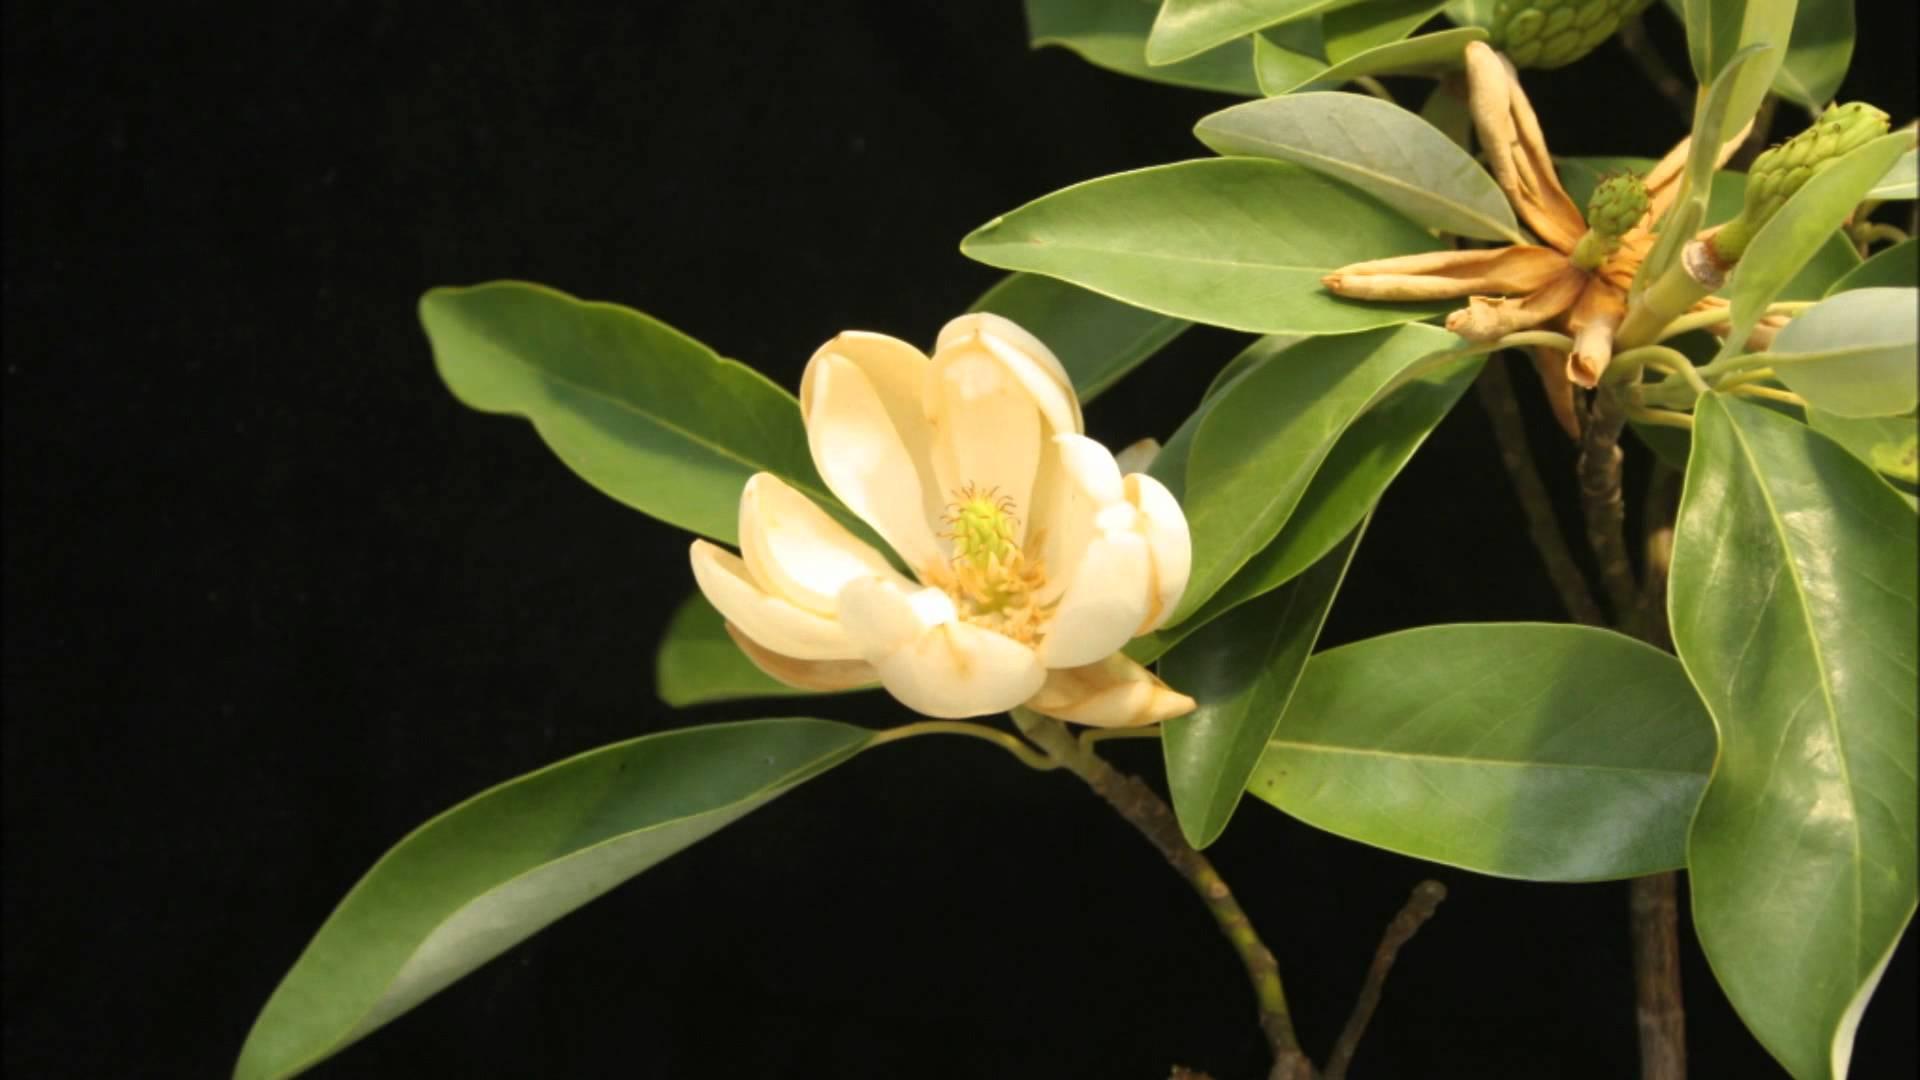 Magnolia flower - YouTube